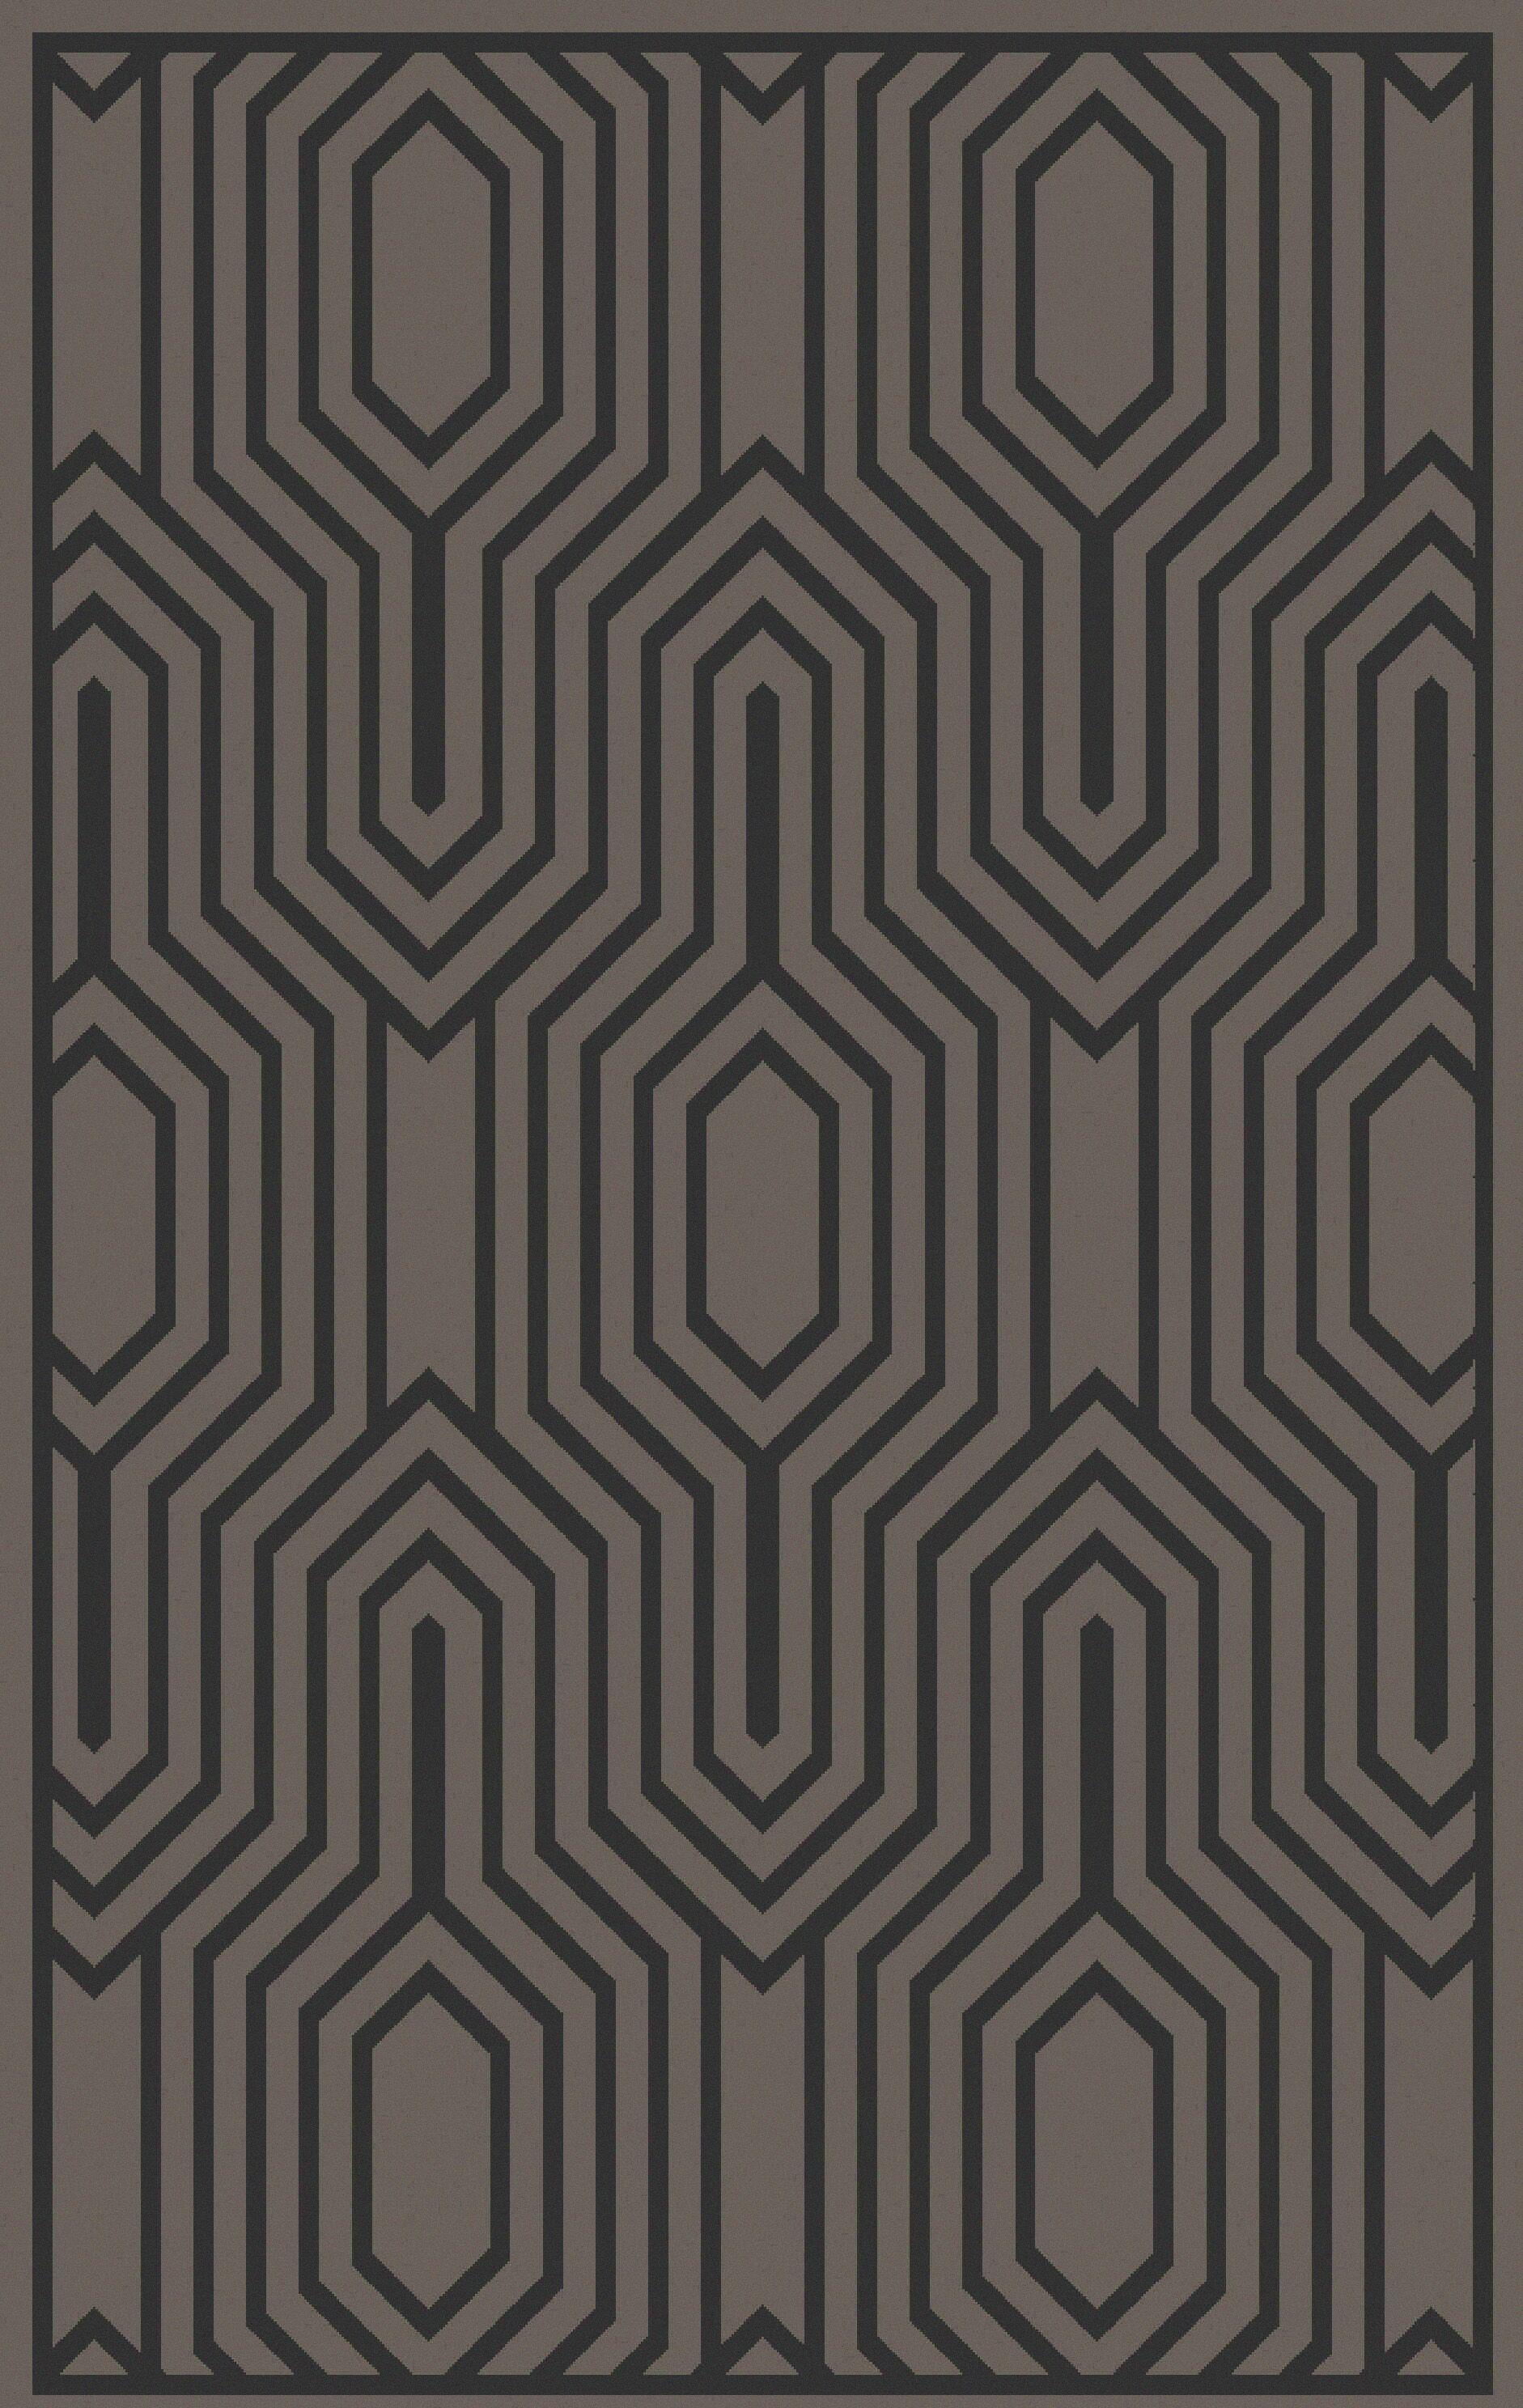 Sula Charcoal Area Rug Rug Size: Rectangle 5' x 8'